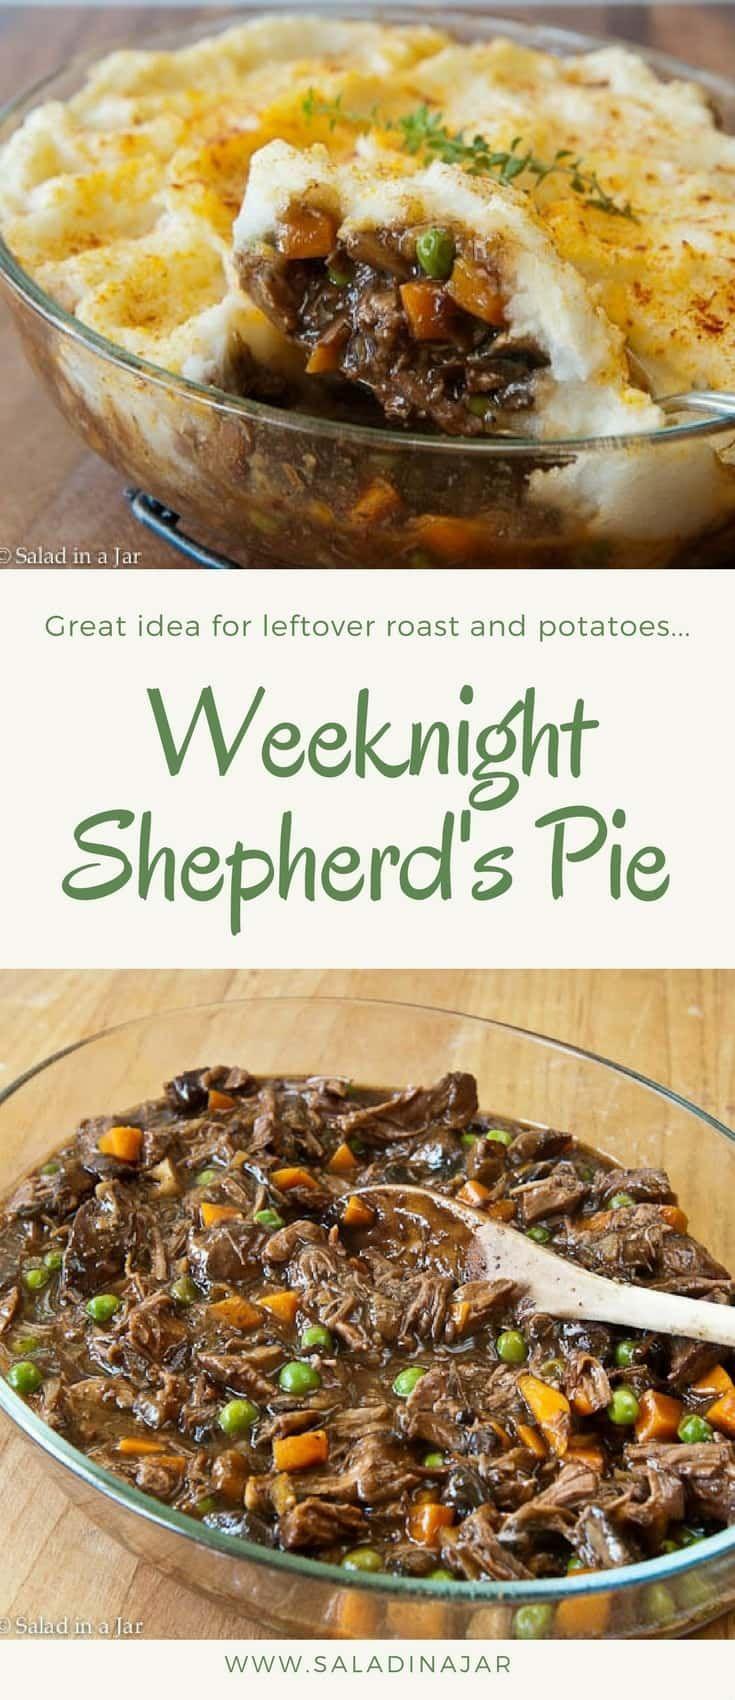 Easy Weeknight Shepherd S Pie With Leftover Roast Beef Recipe Leftover Beef Recipes Roast Beef Recipes Leftover Prime Rib Recipes